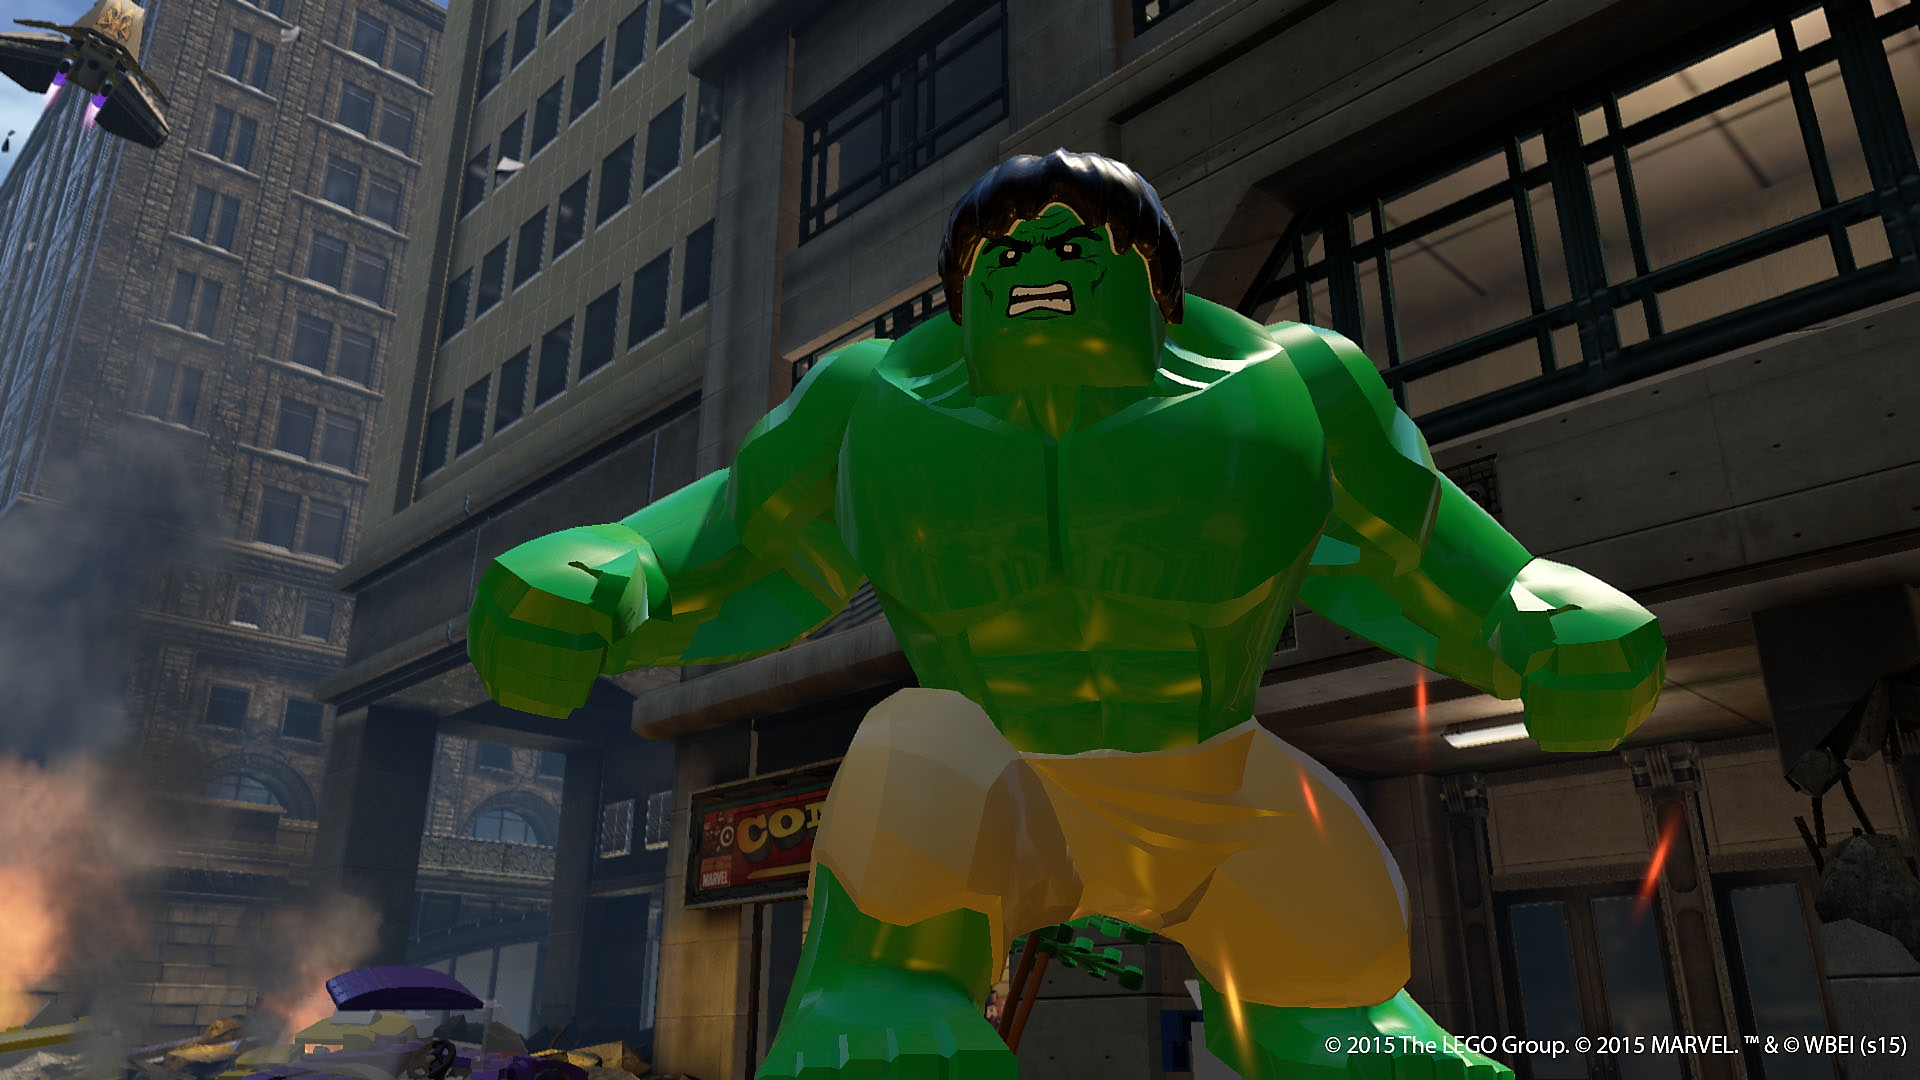 LEGO マーベル アベンジャーズ - Gallery Screenshot 5